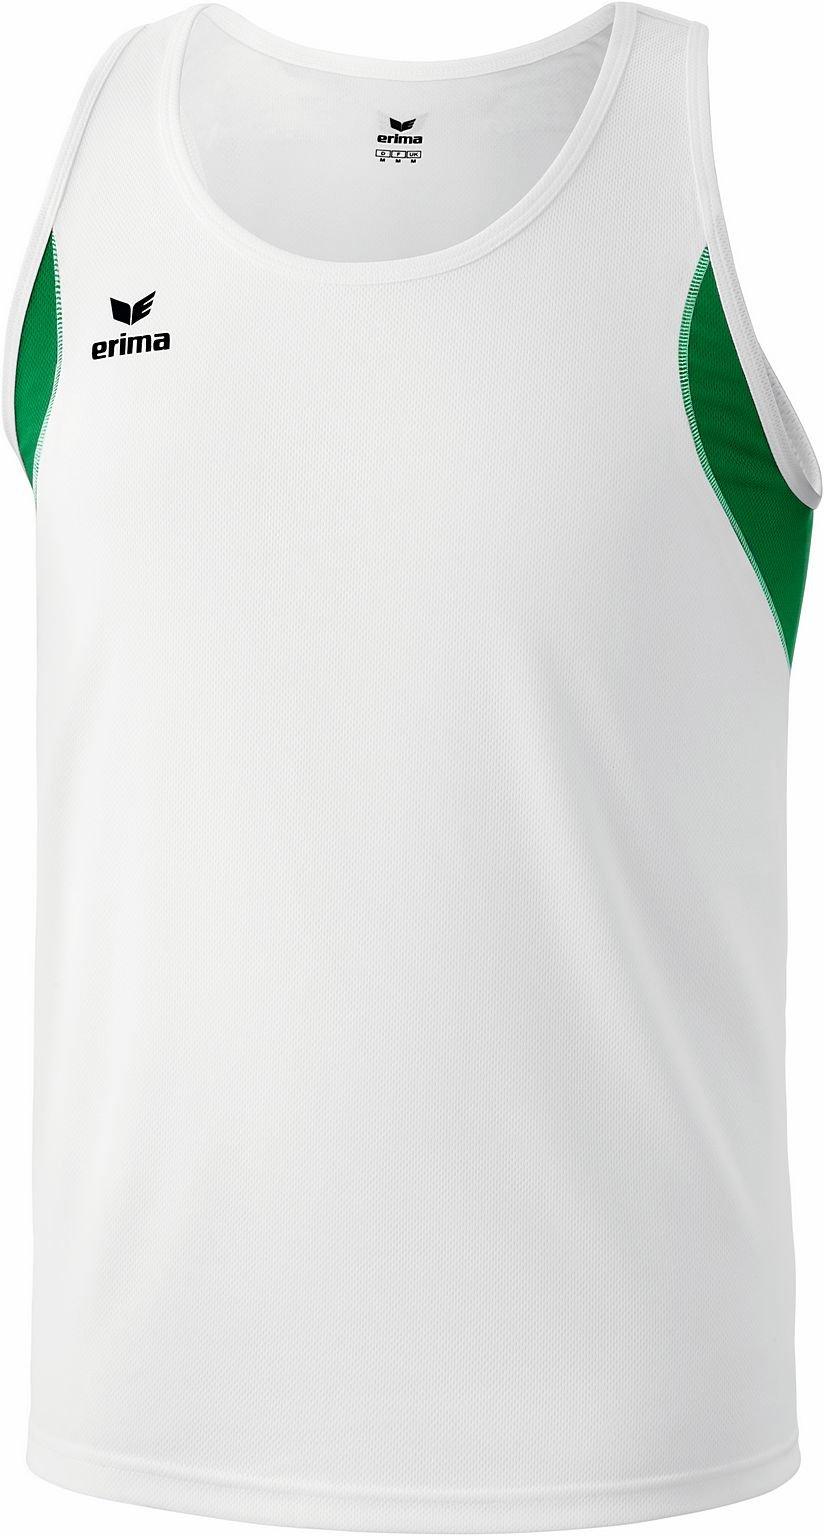 Erima - Canottiera junior da running, Bianco (Bianco/smeraldo), 164